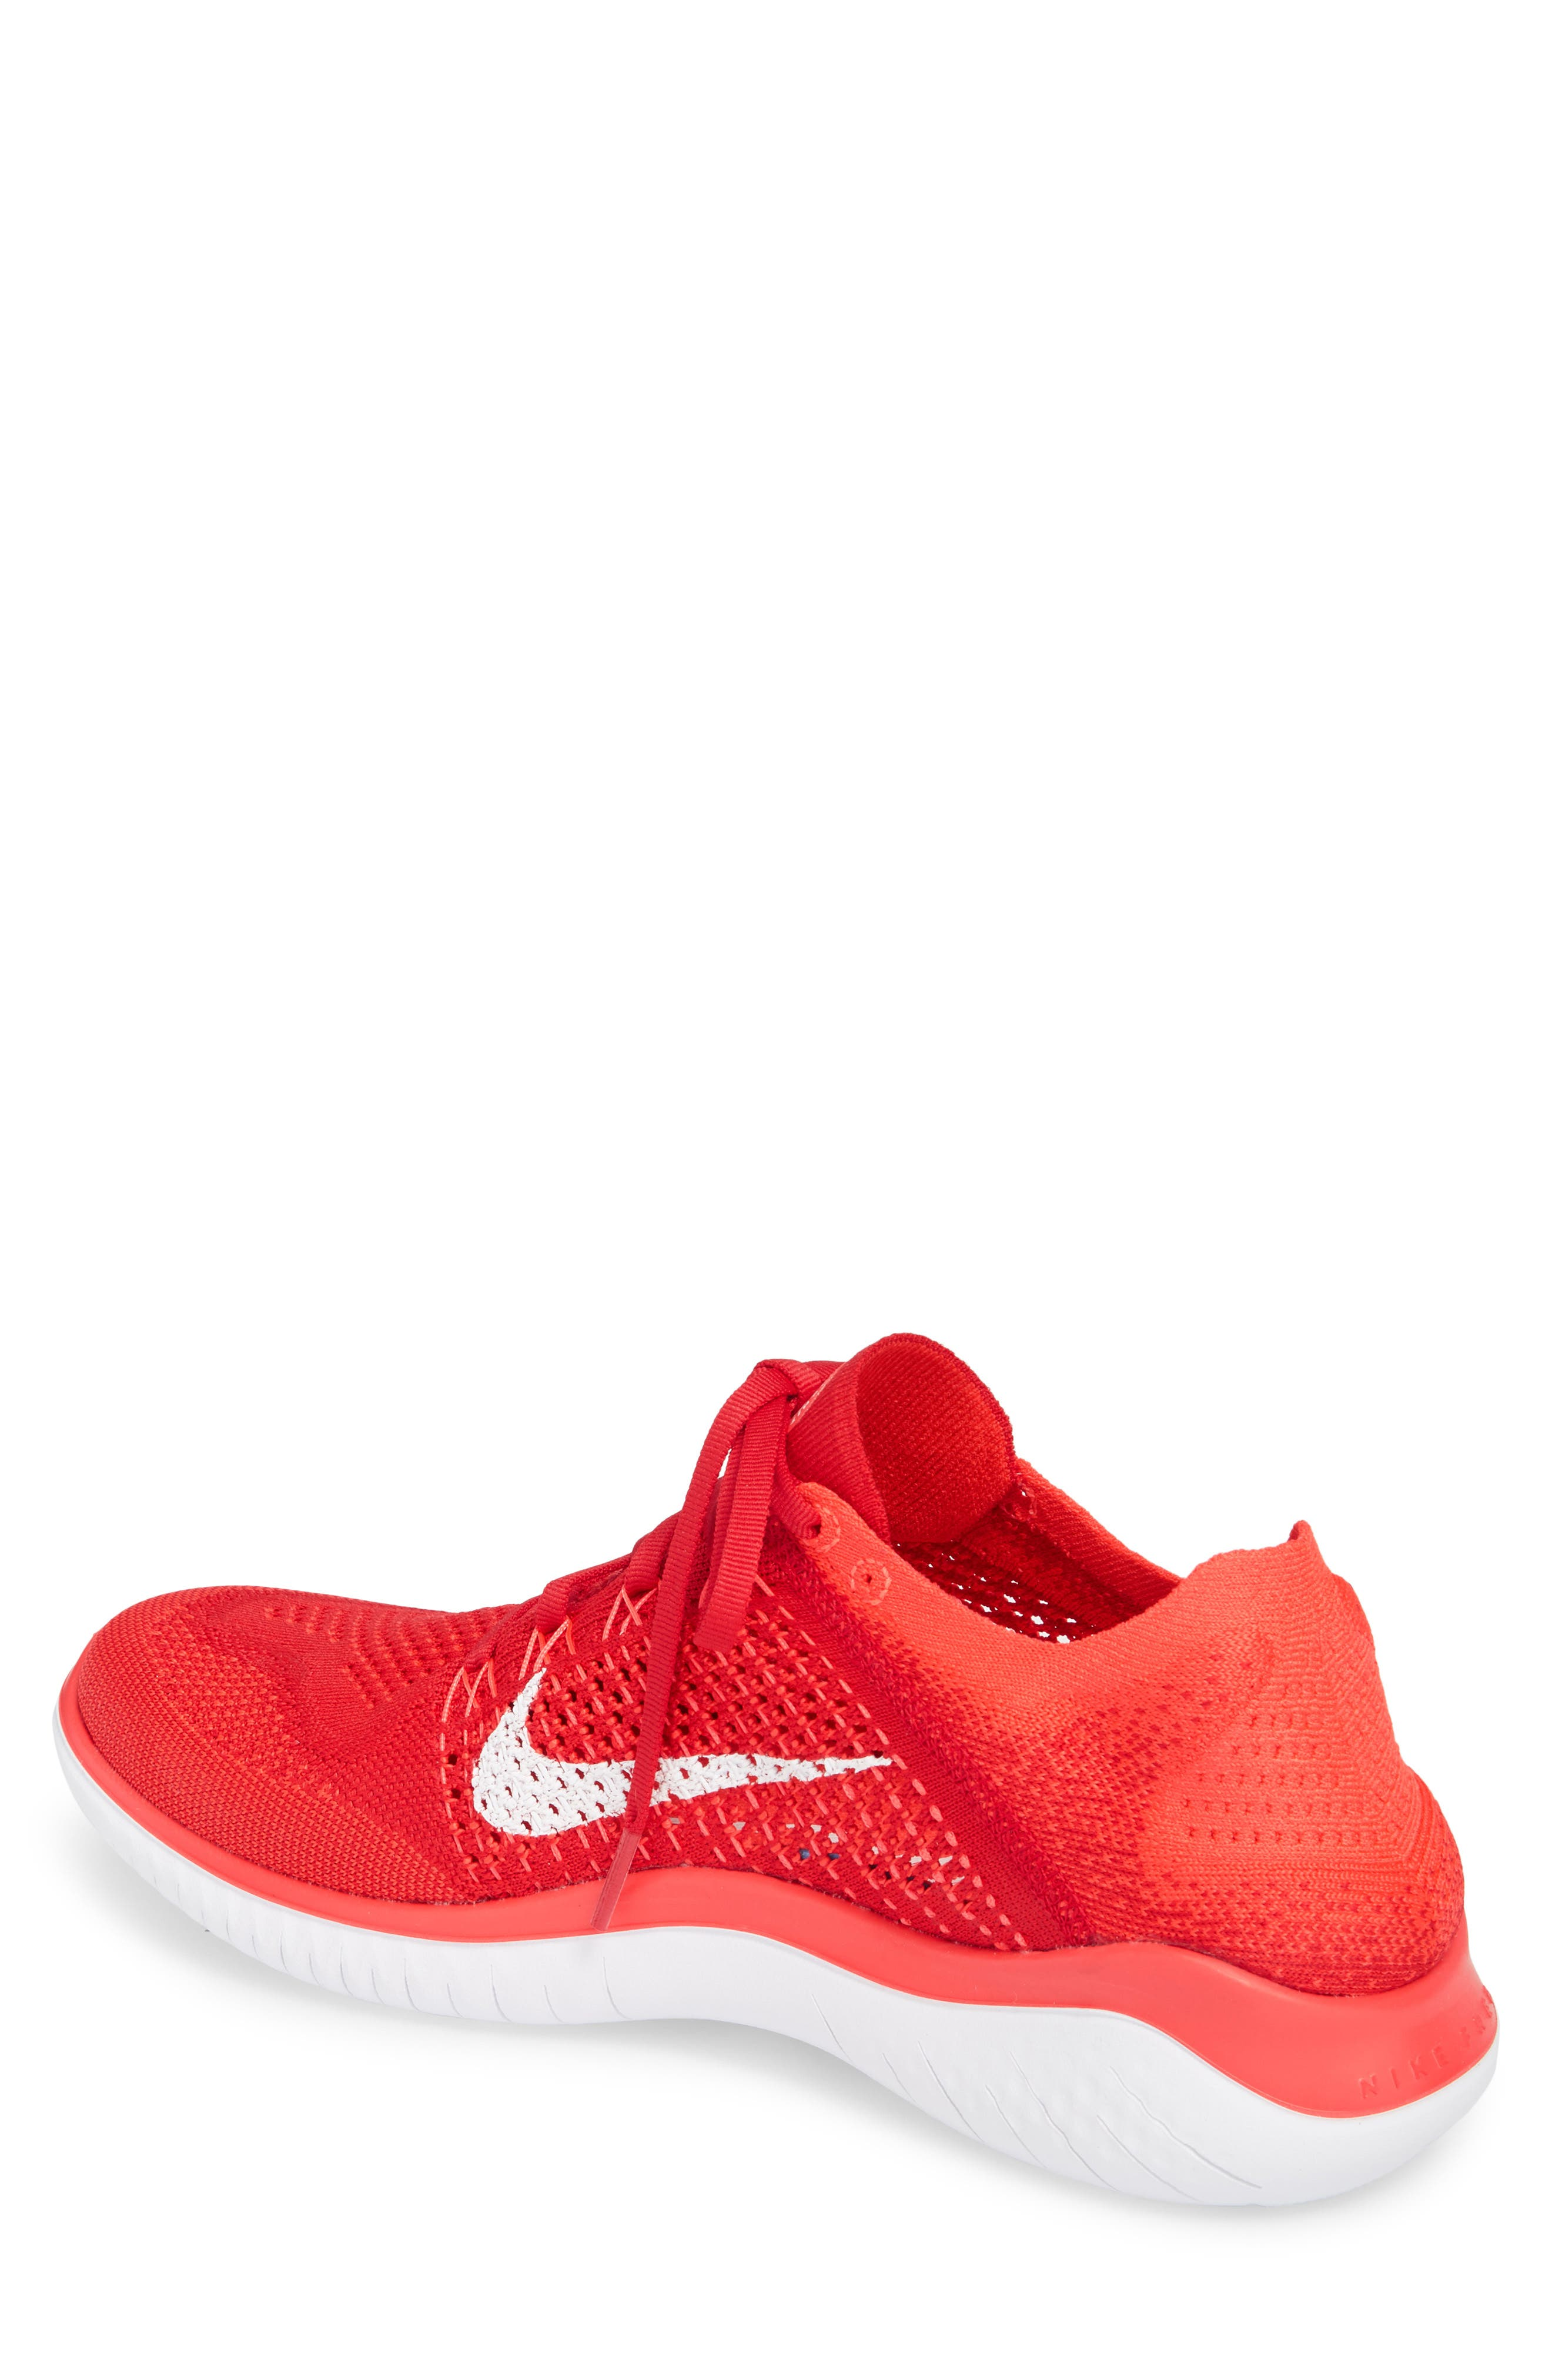 8e0a51172e49 Nike Flyknit